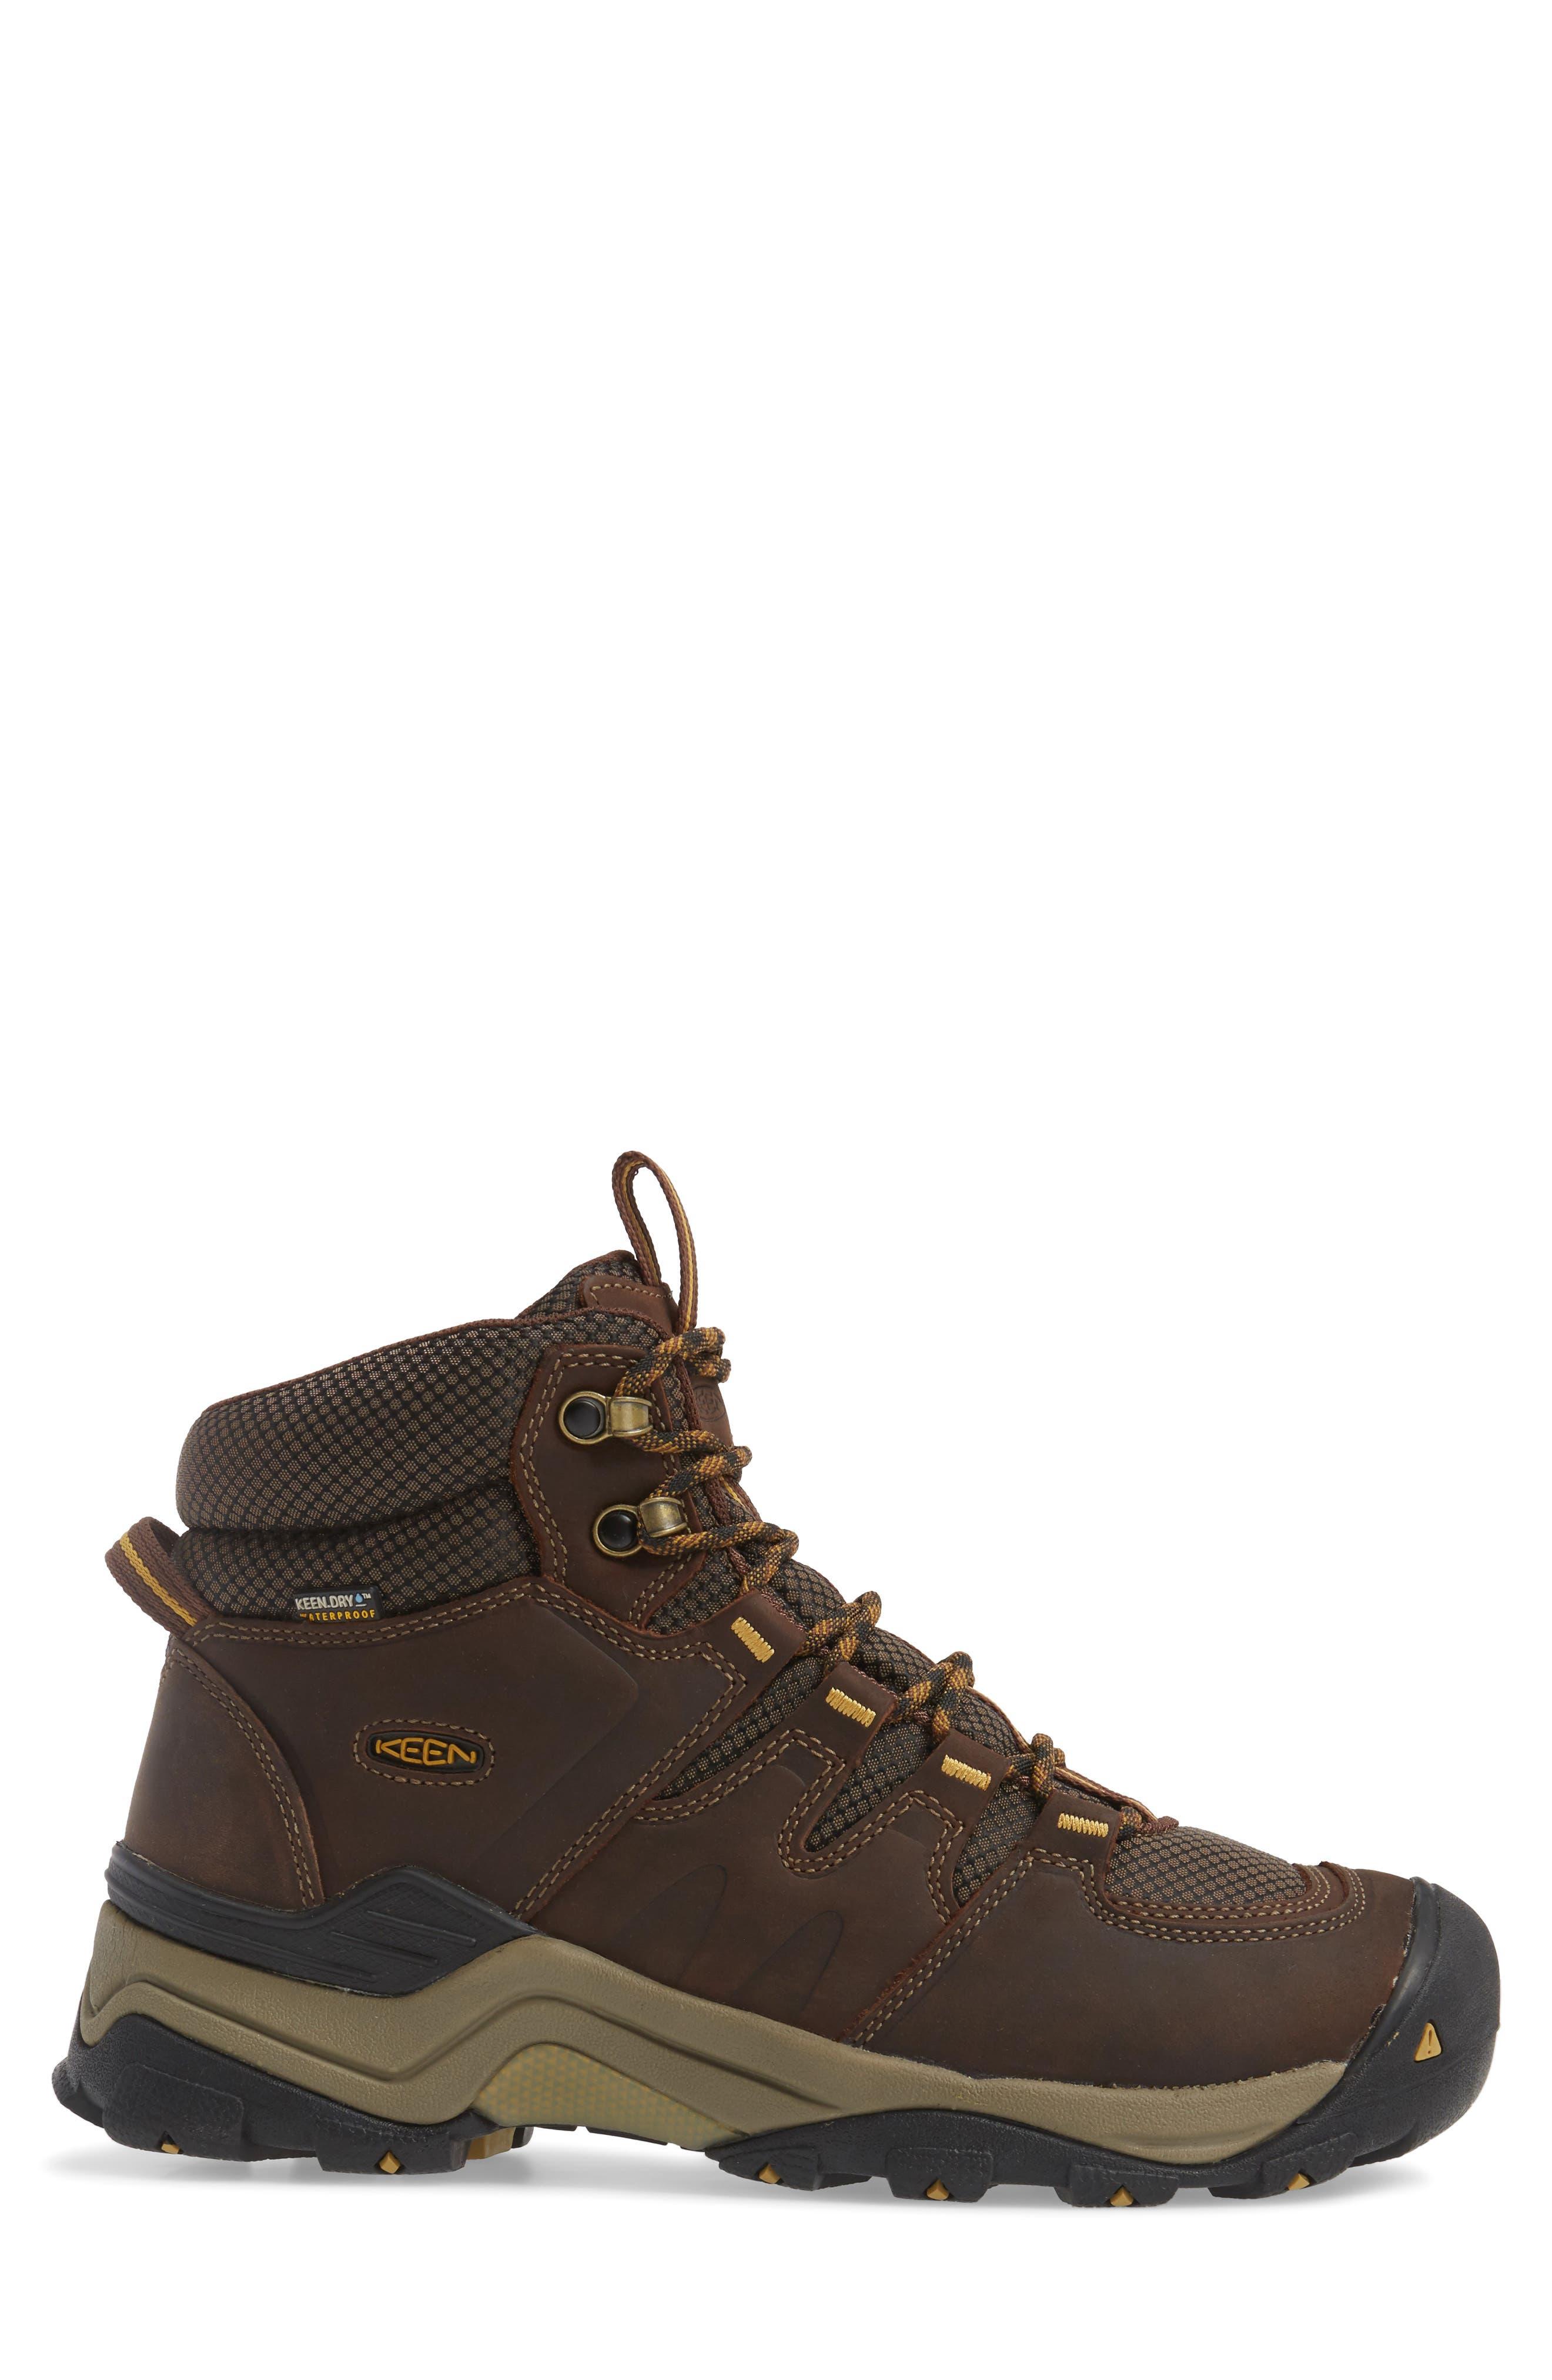 Alternate Image 3  - Keen Gypsum II Waterproof Hiking Boot (Men)